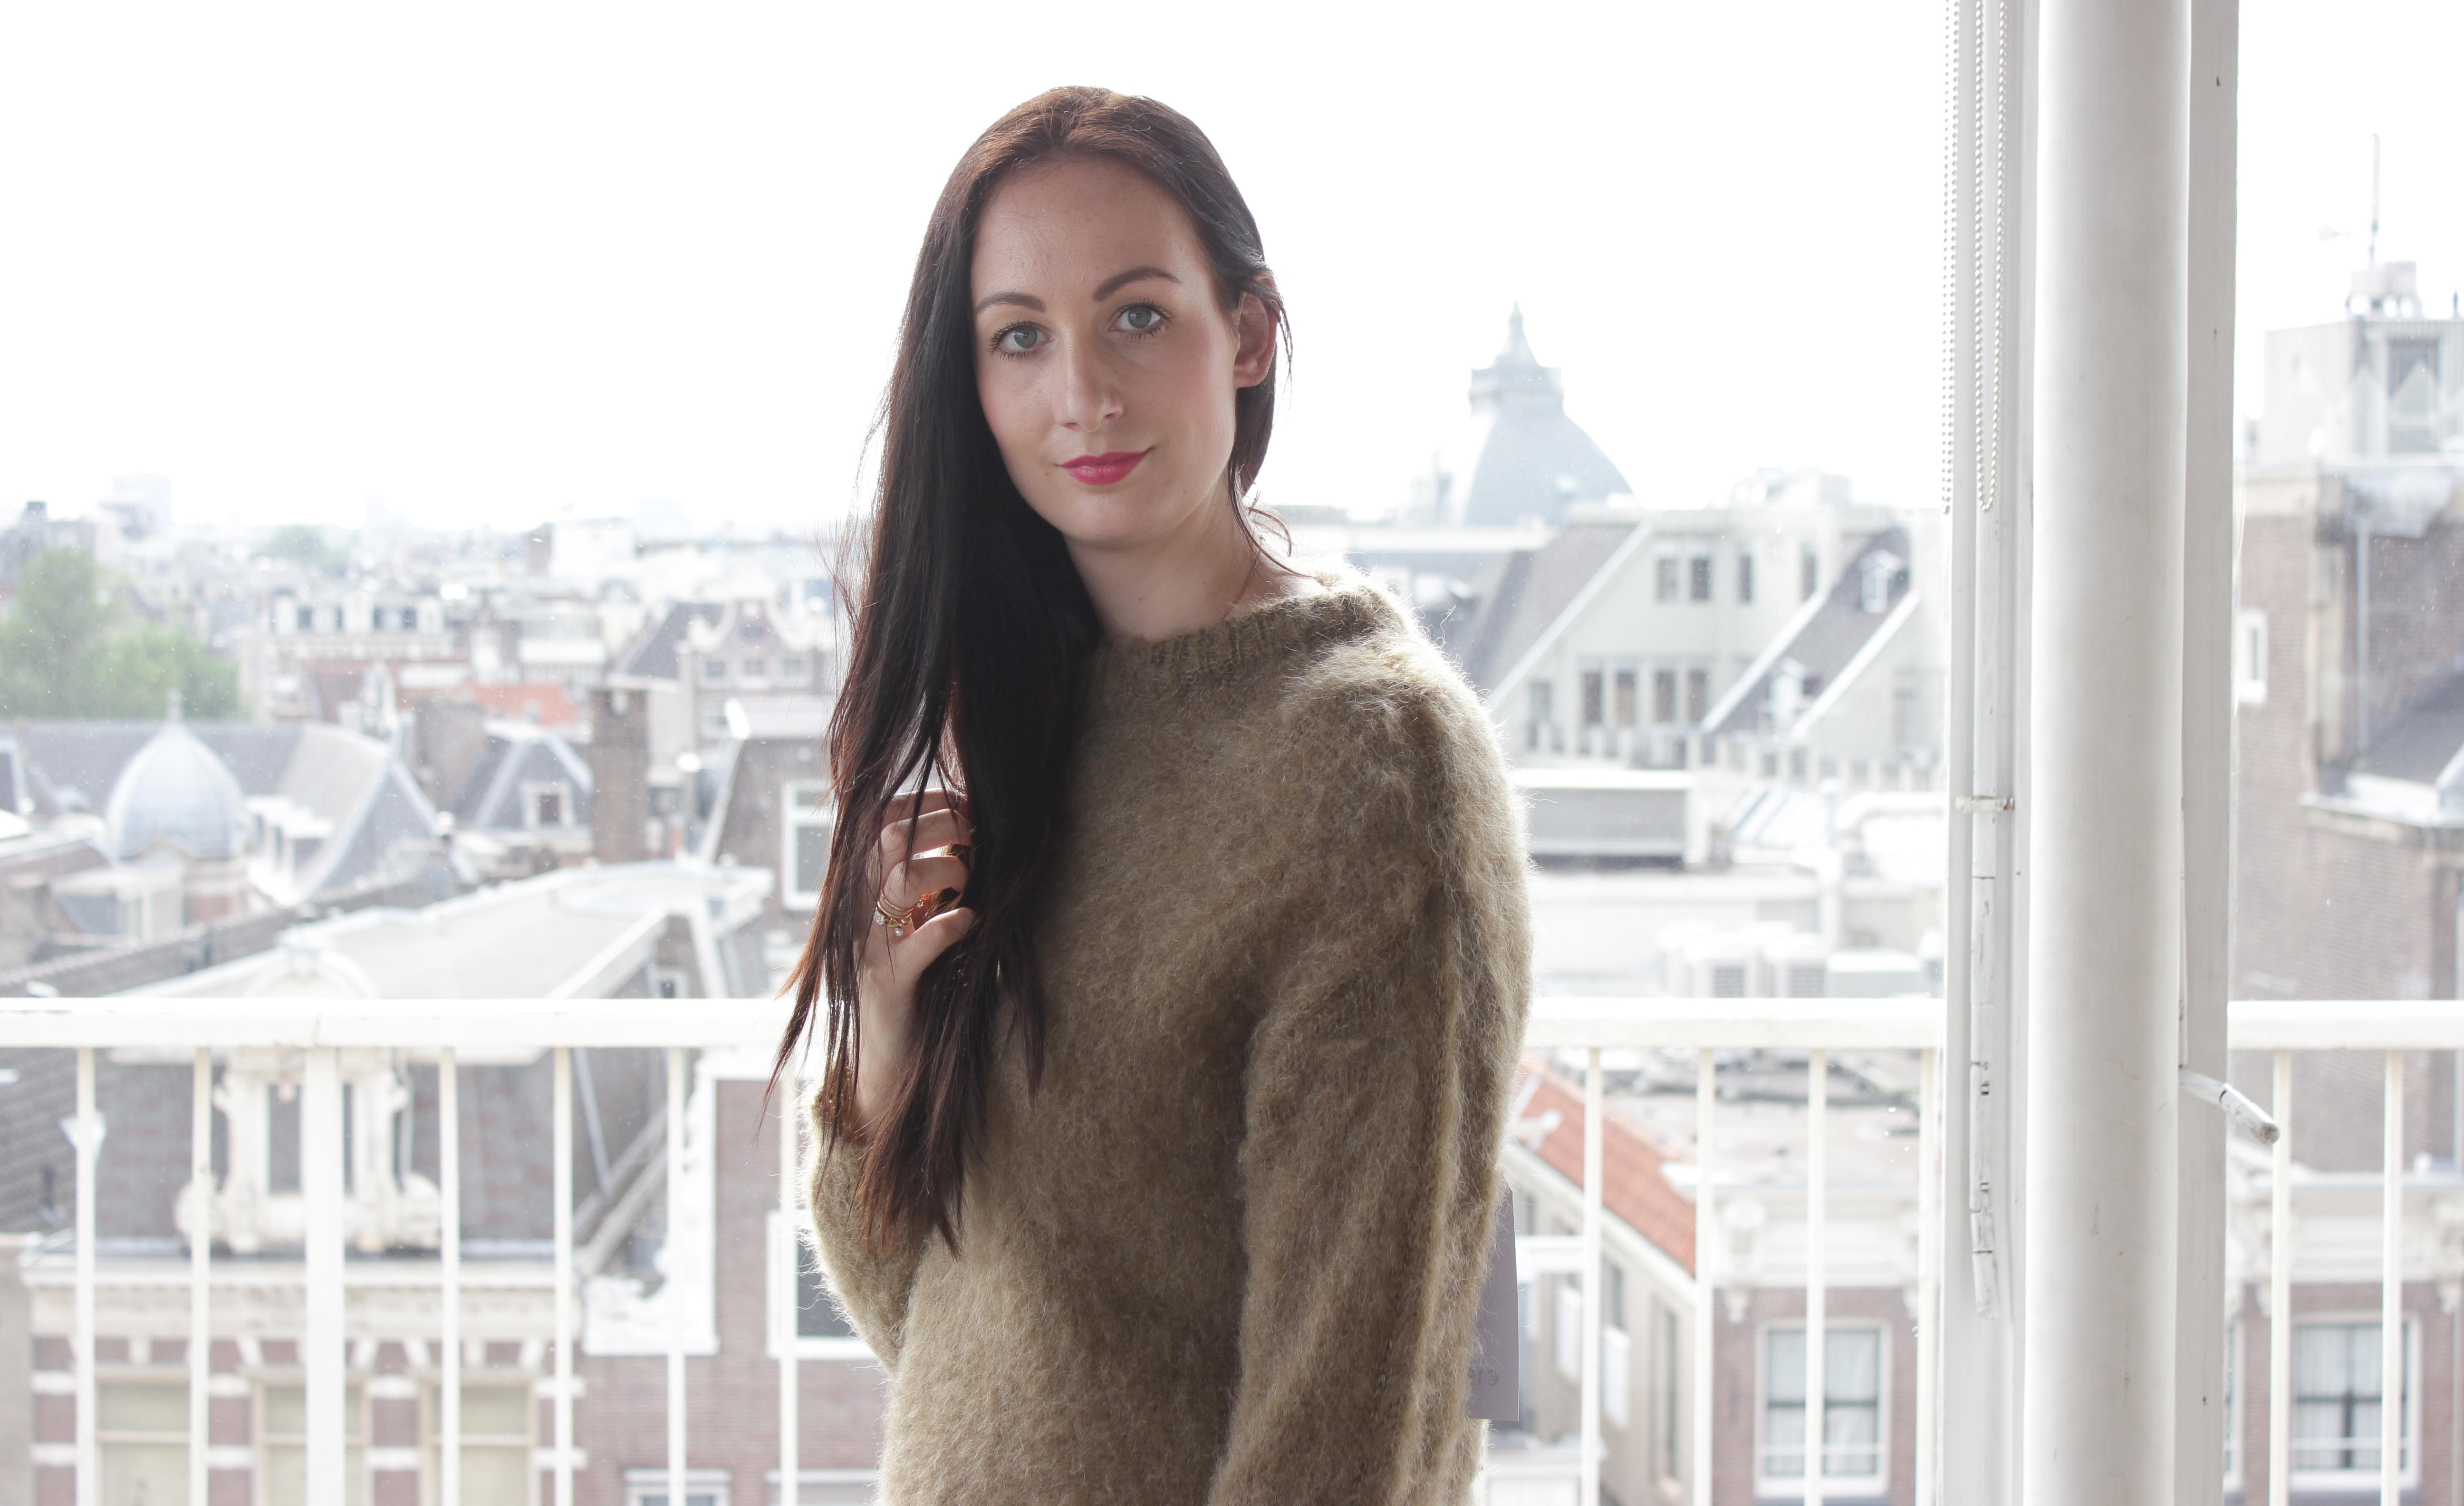 Primark AW15 herfst winter 2015 home beauty fashion kleding nieuw nieuwe collectie Amsterdam The Vier Rokin 75 OONA Amsterdam PR bureau blogger lifestyle by linda